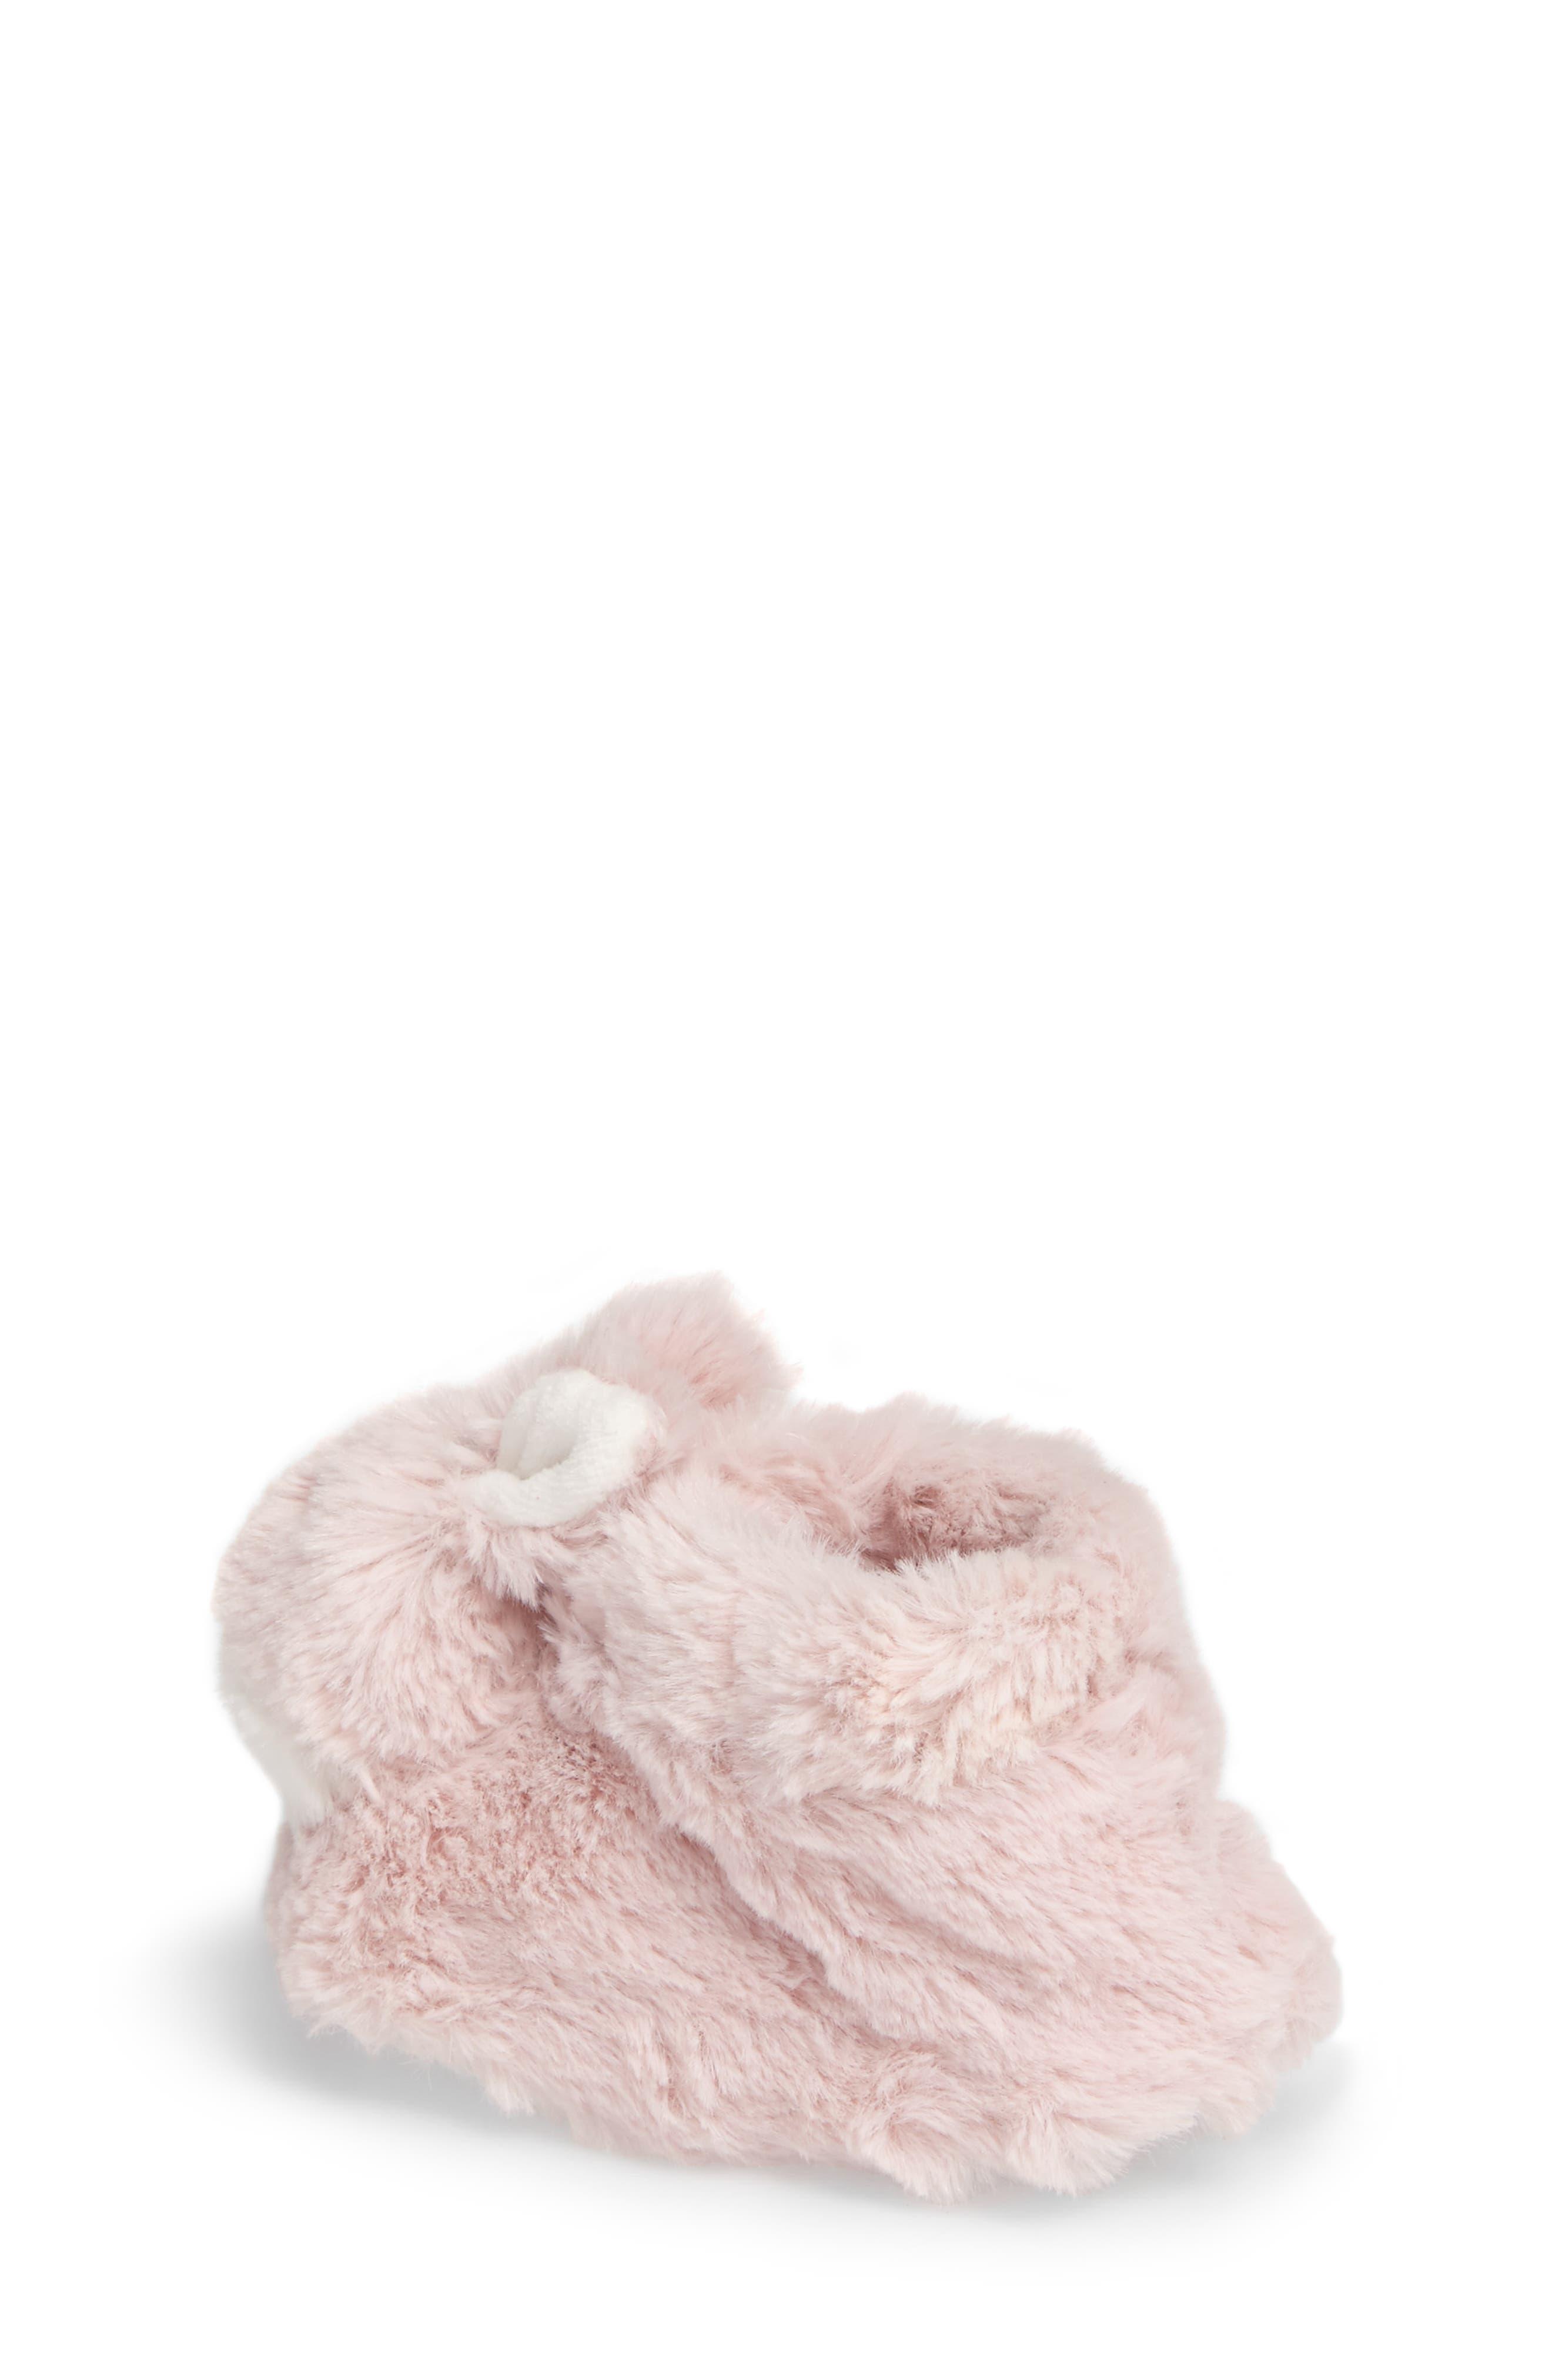 Plush Animal Slipper,                             Alternate thumbnail 2, color,                             Pink Bunny